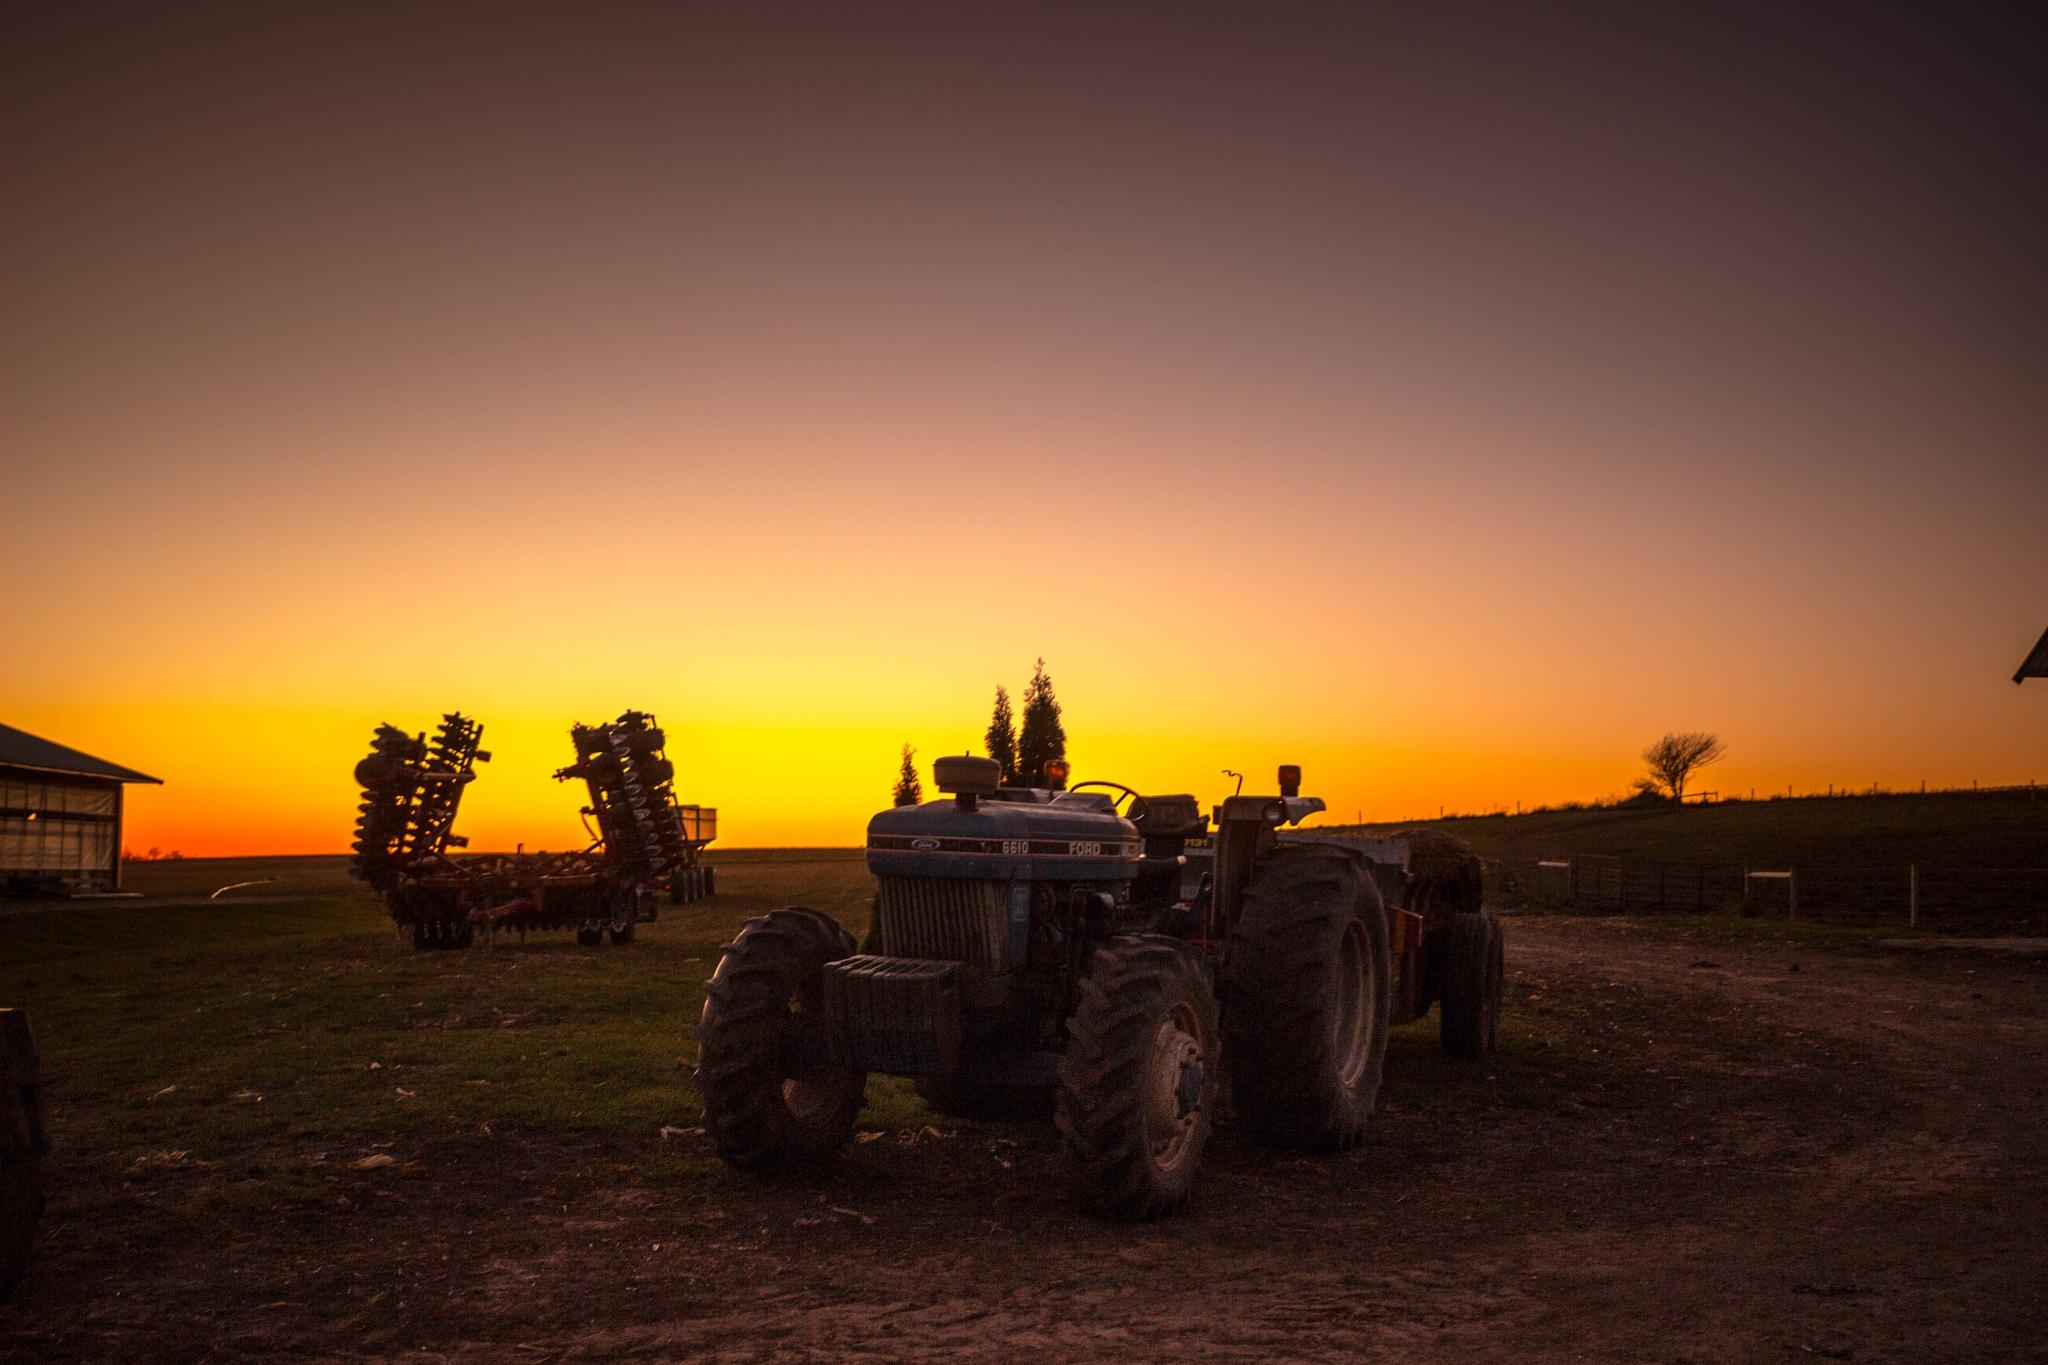 Sunset - Wisconsin by Ashwin Sivakumar